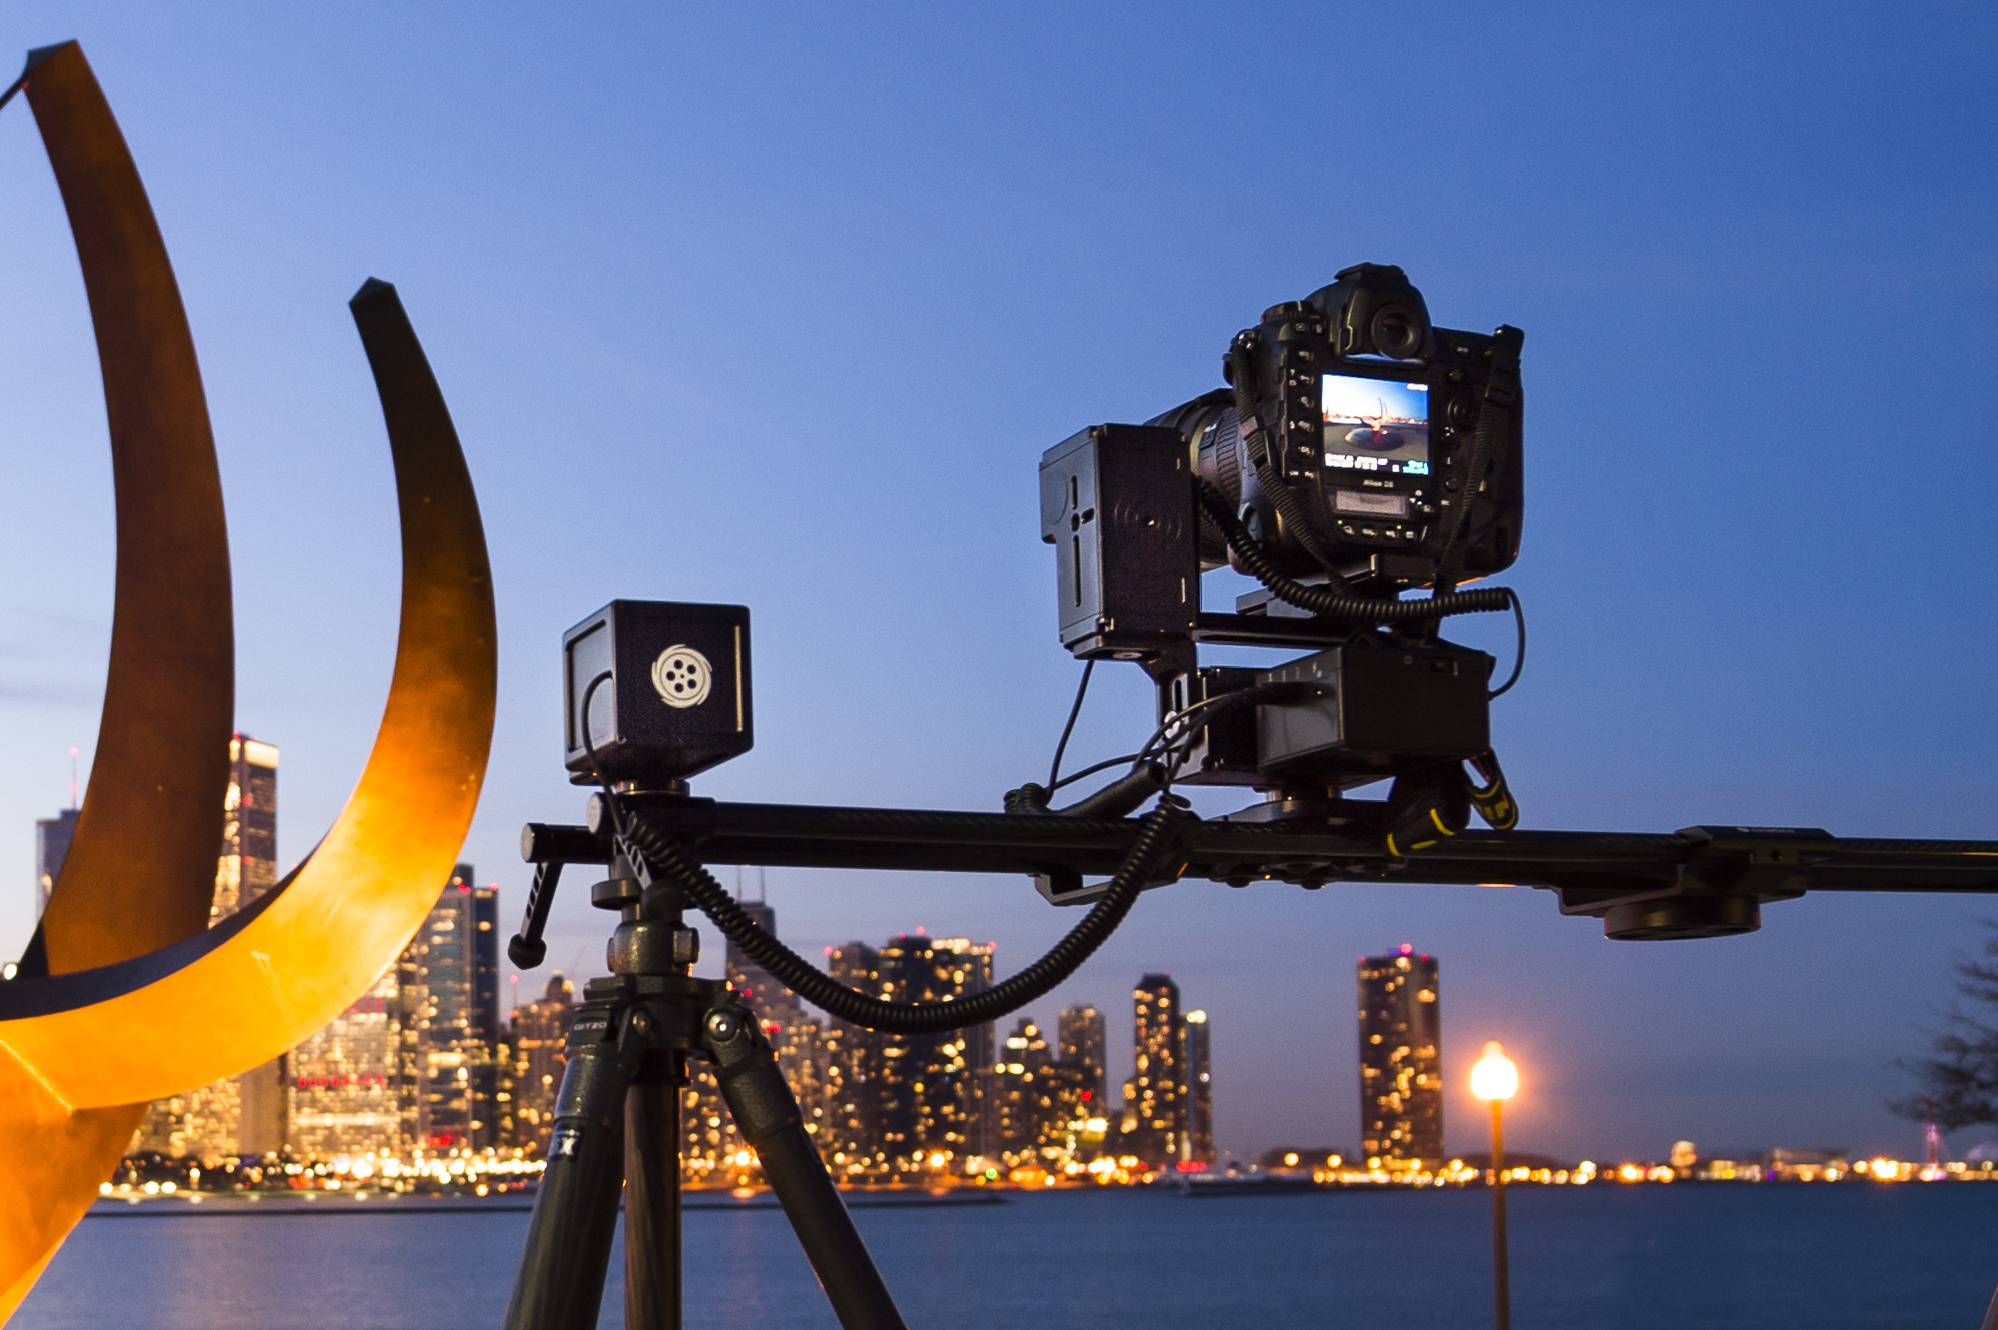 Cinetics Lynx motion control system review: Digital